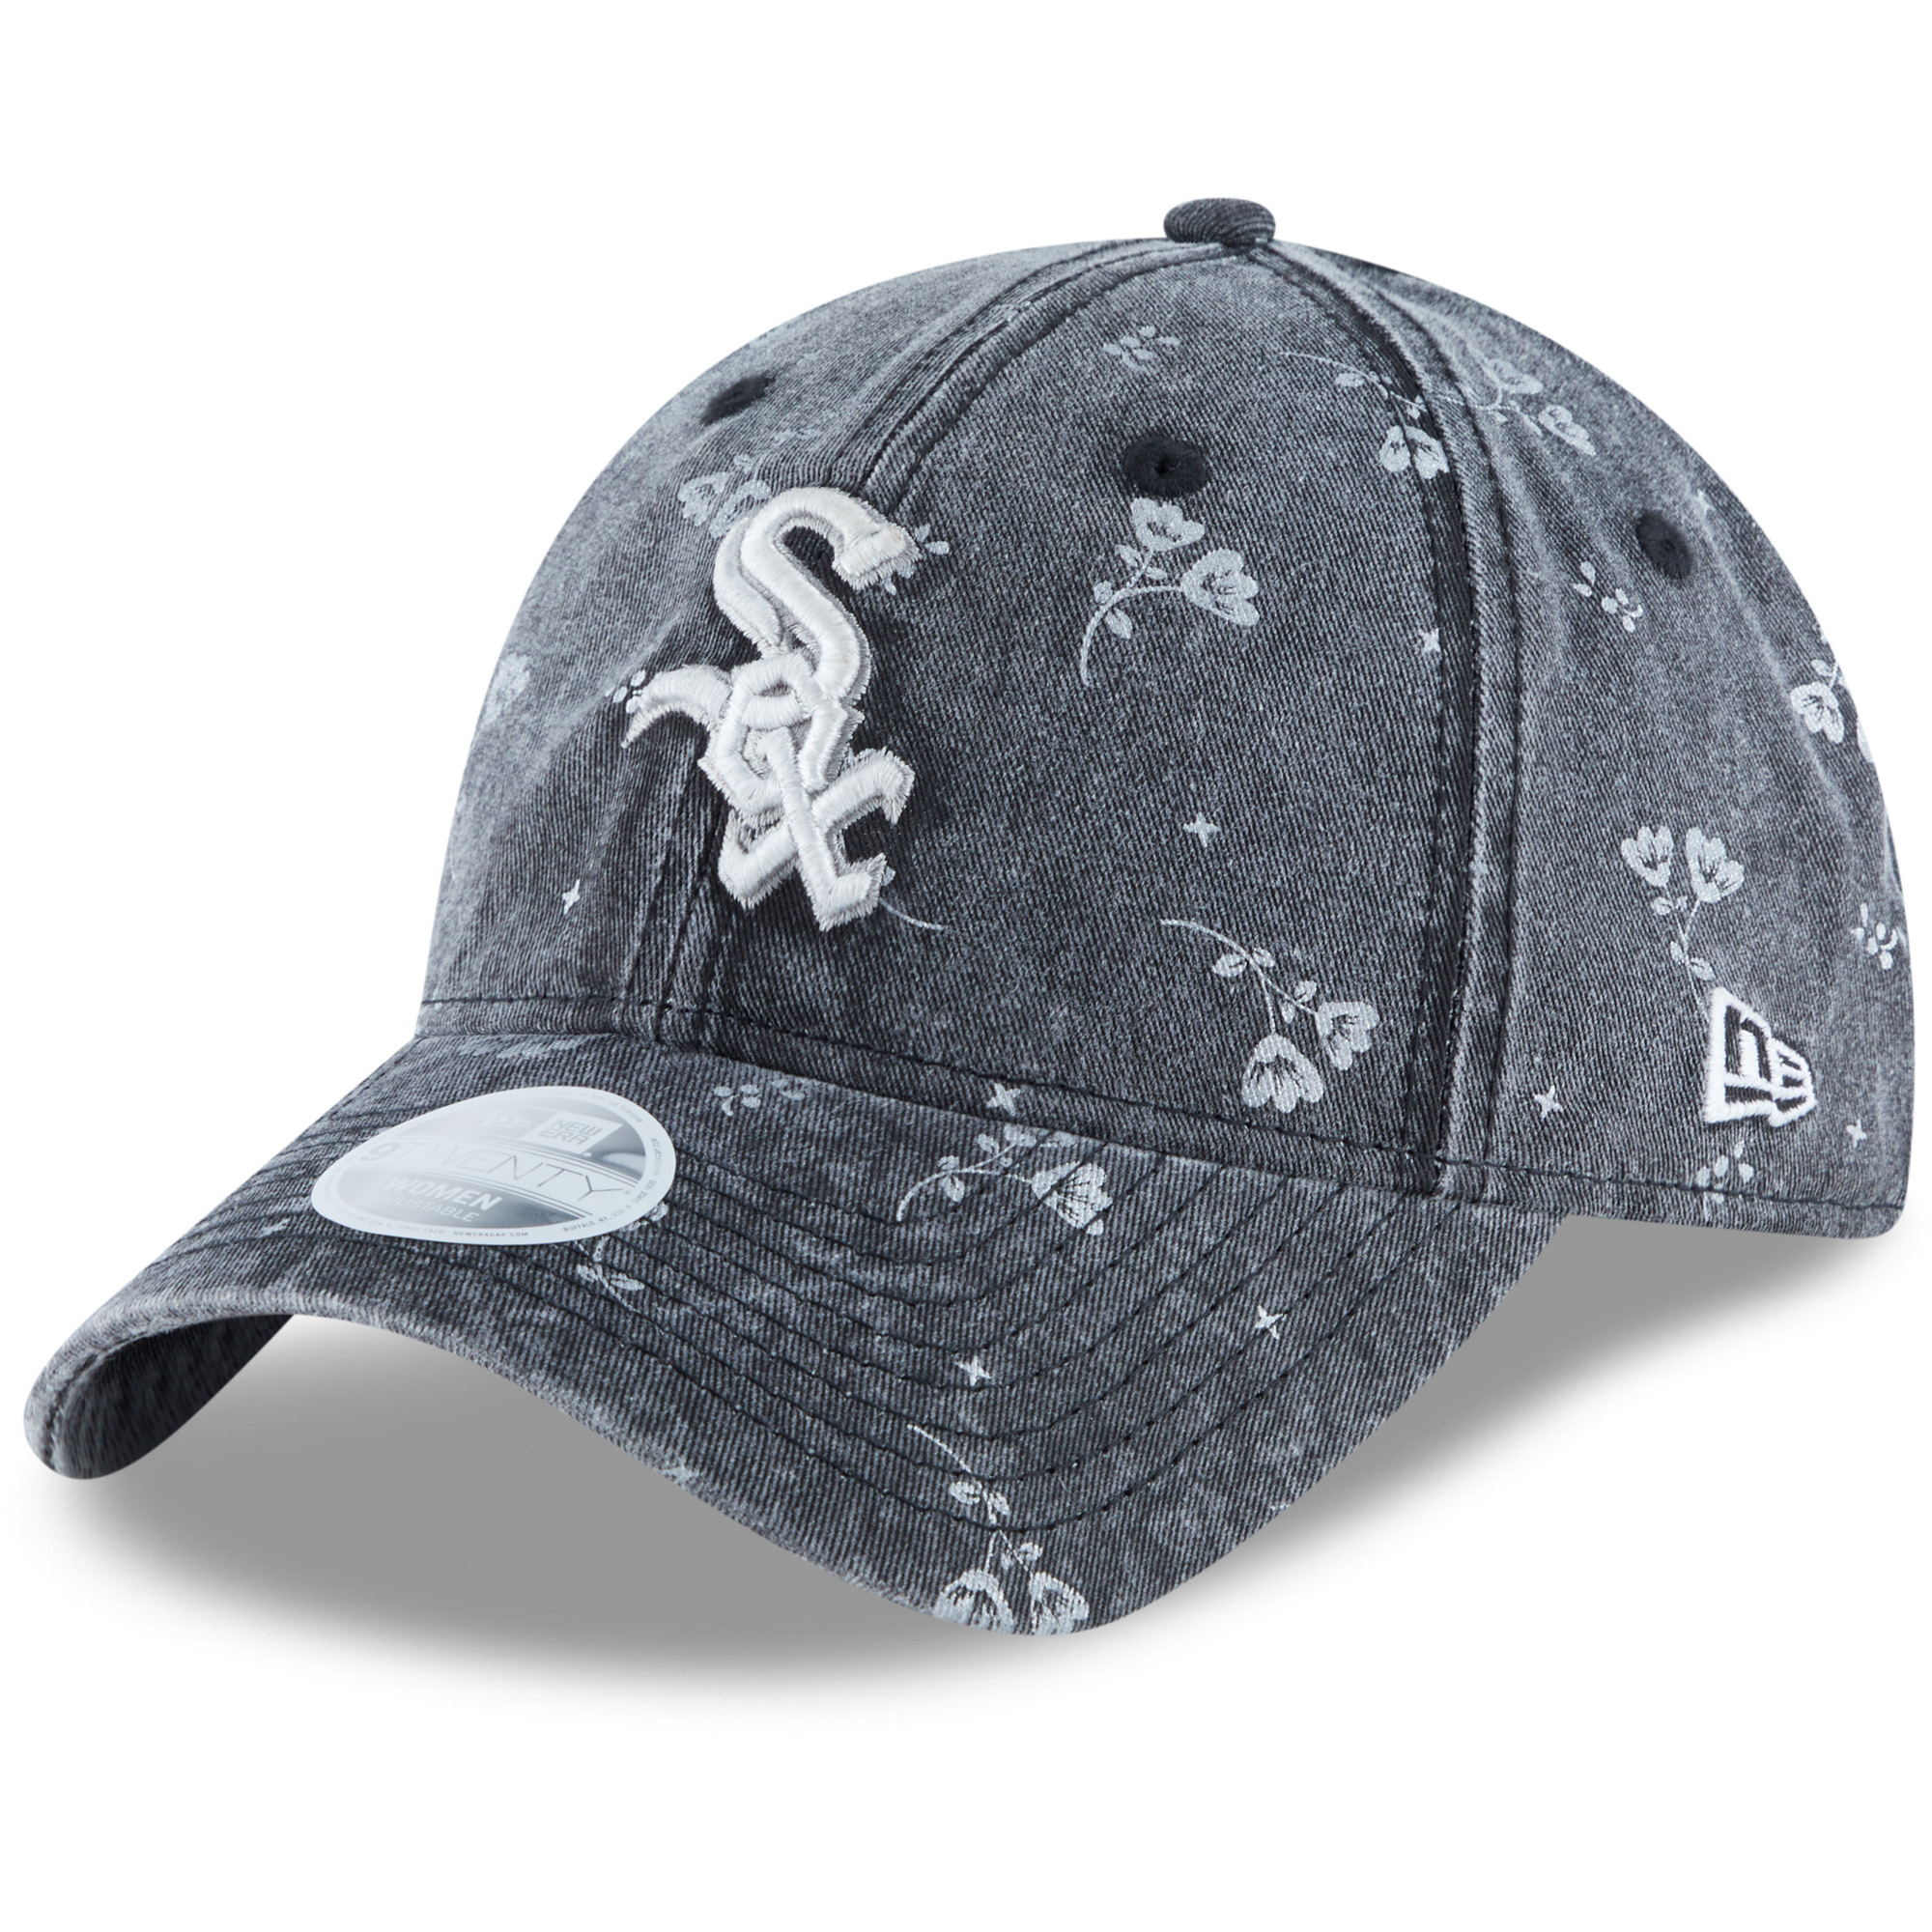 Chicago White Sox New Era Women's Floral Shine 9TWENTY Adjustable Hat - Black - OSFA